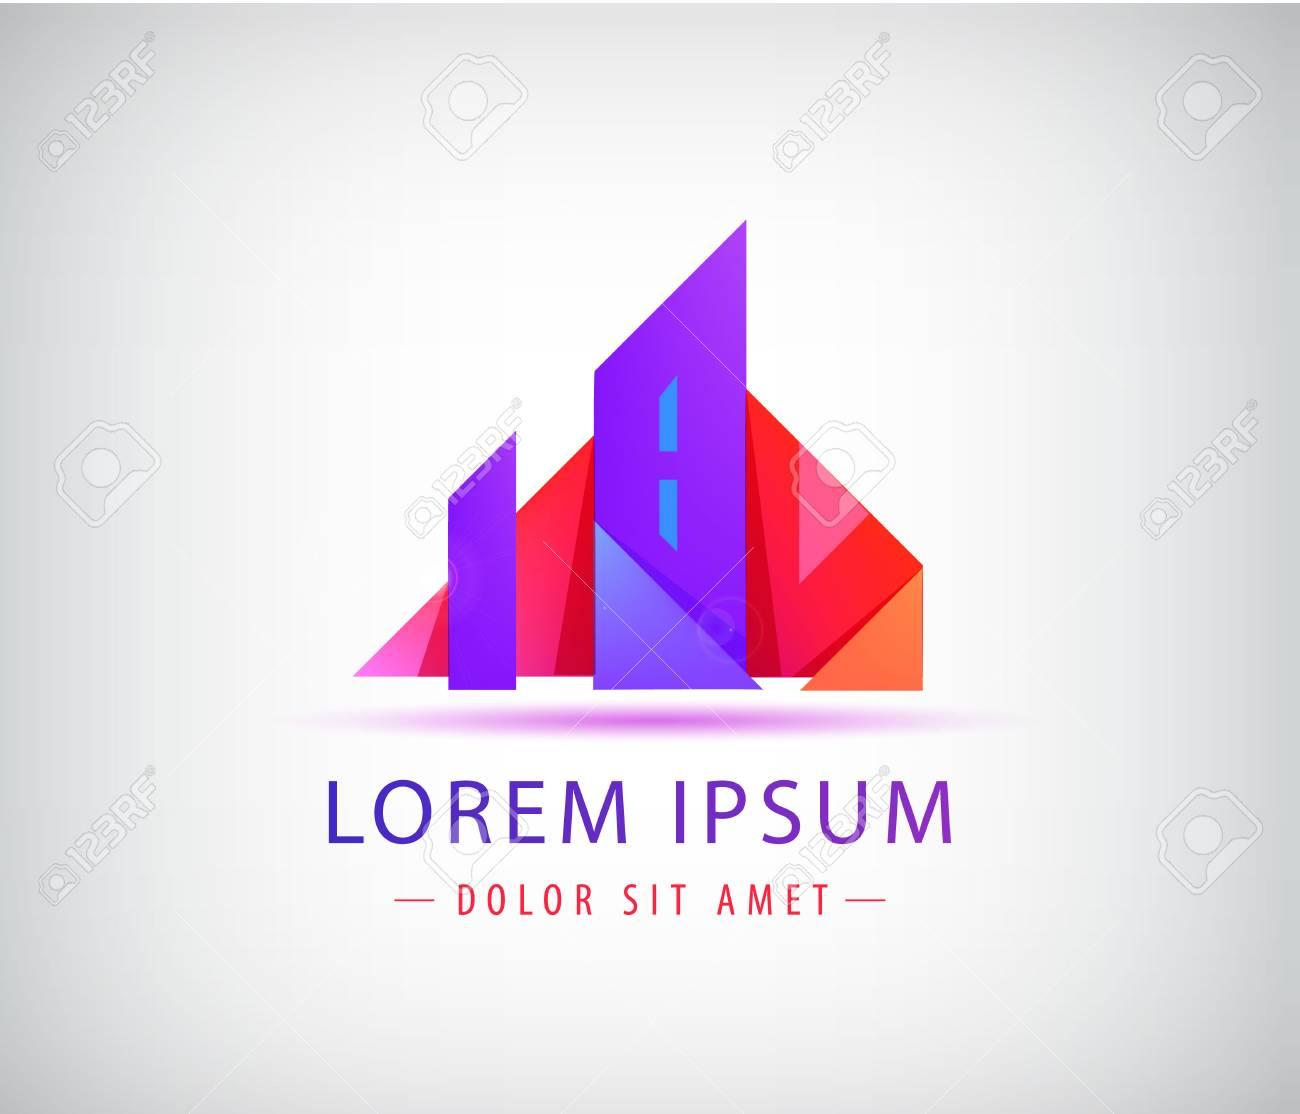 Real estate logo template. Origami city concept, building - 125472777